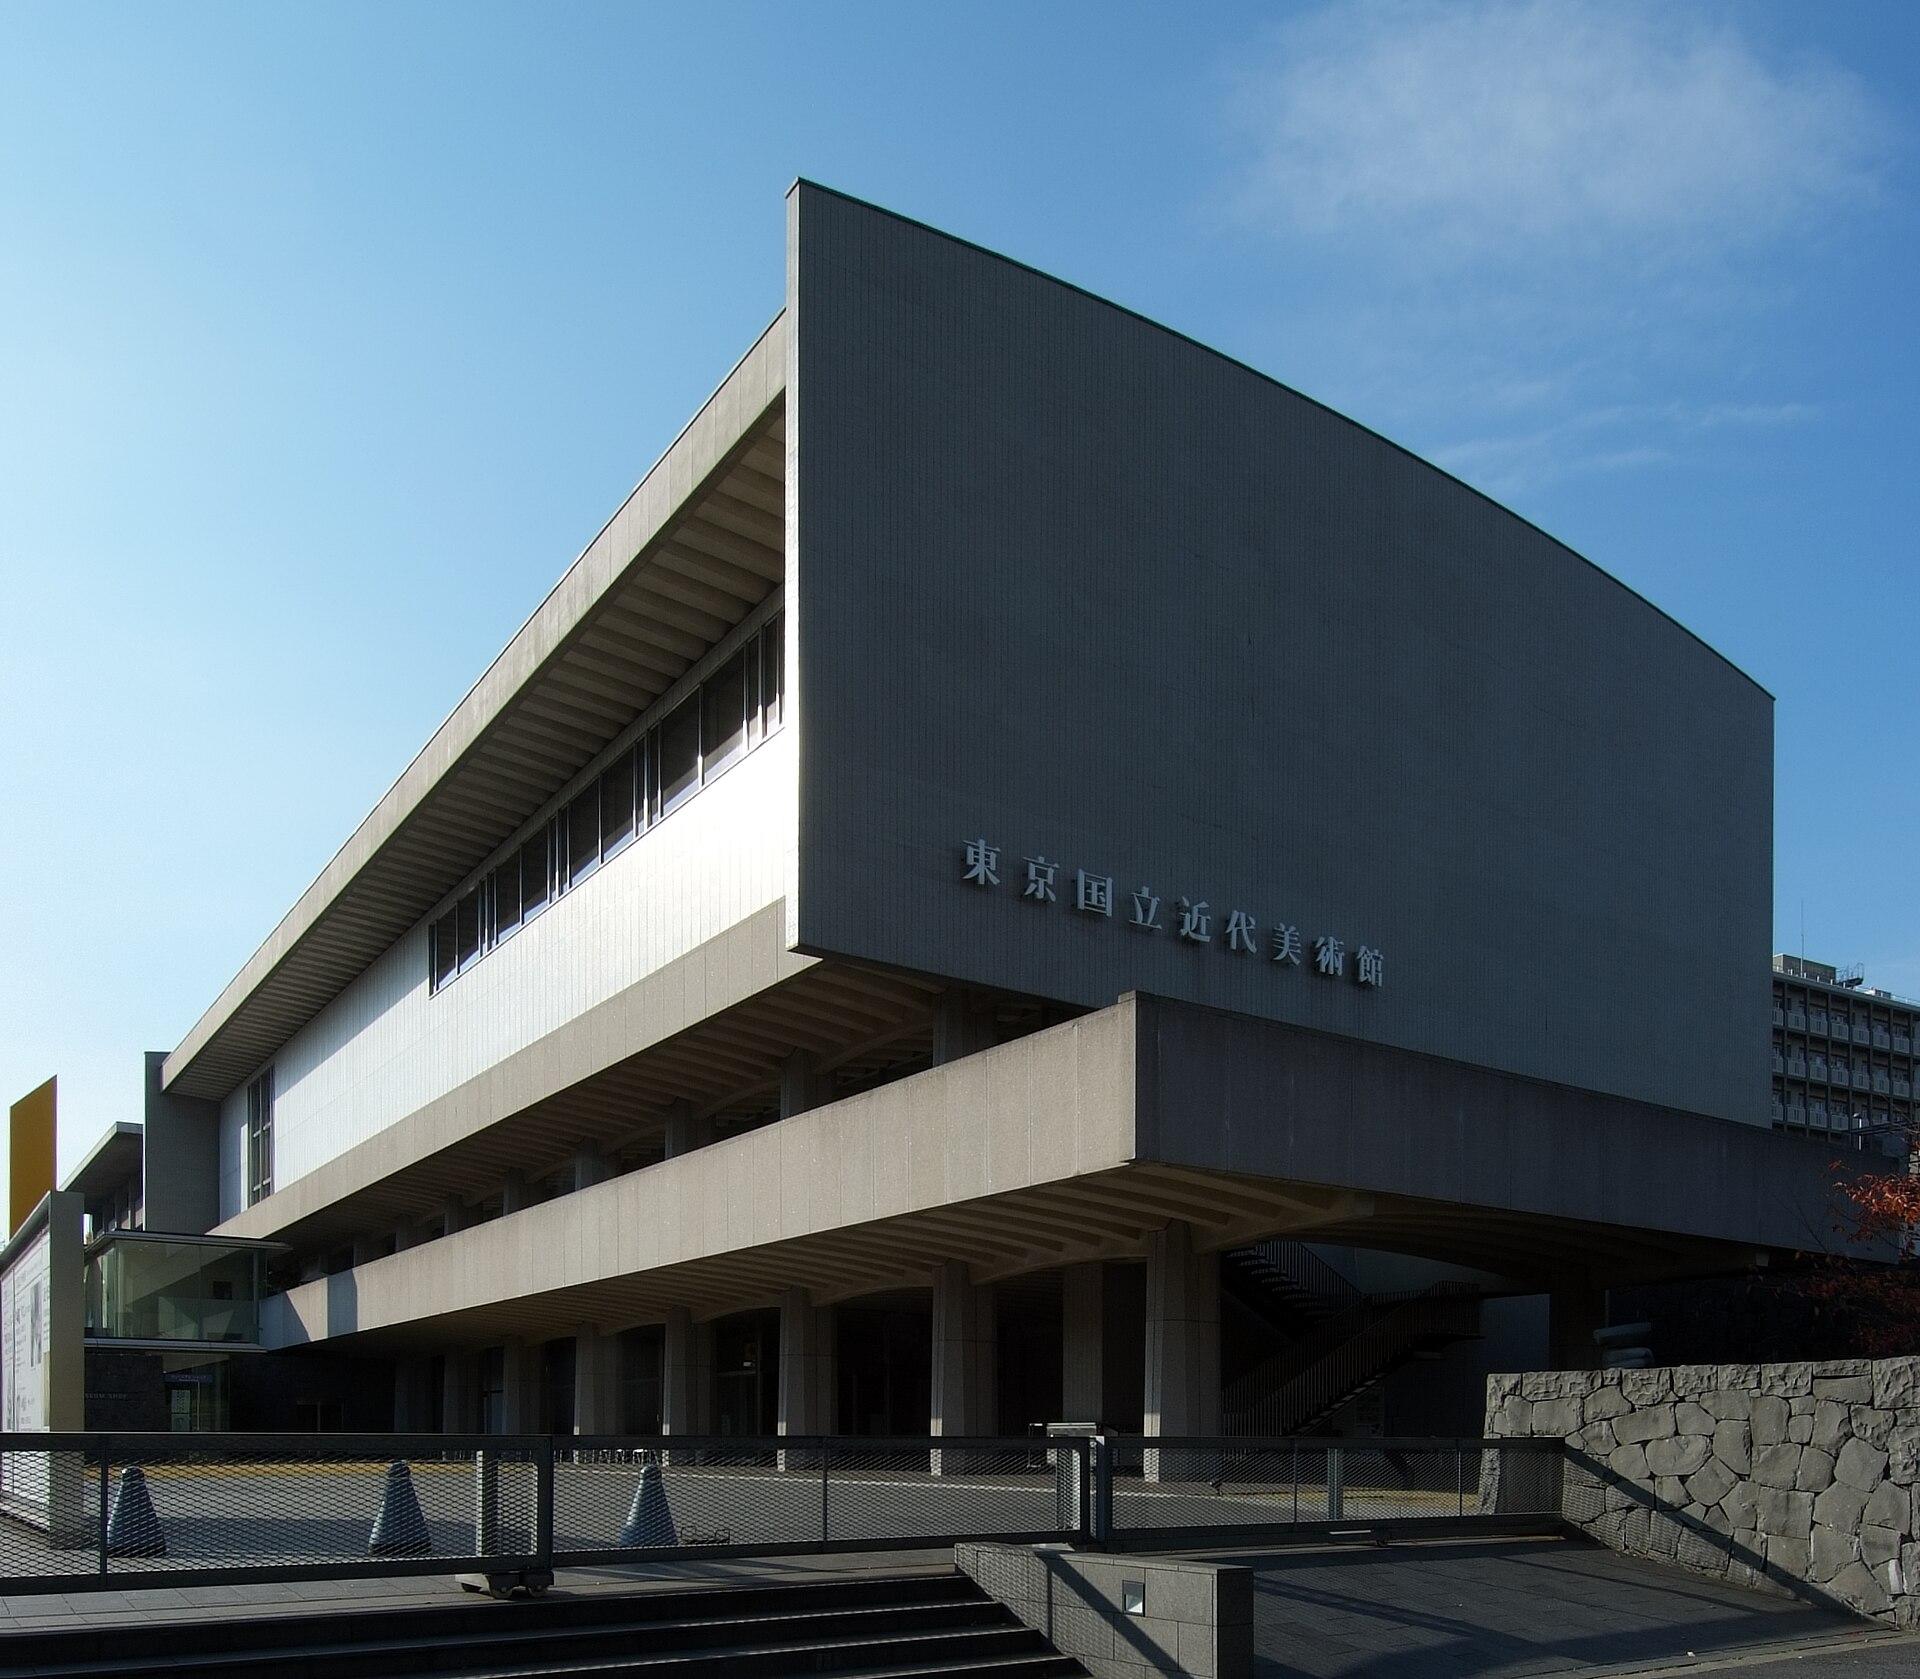 https://upload.wikimedia.org/wikipedia/commons/thumb/5/5c/National_Museum_of_Modern_Art%2C_Tokyo.jpg/1920px-National_Museum_of_Modern_Art%2C_Tokyo.jpg